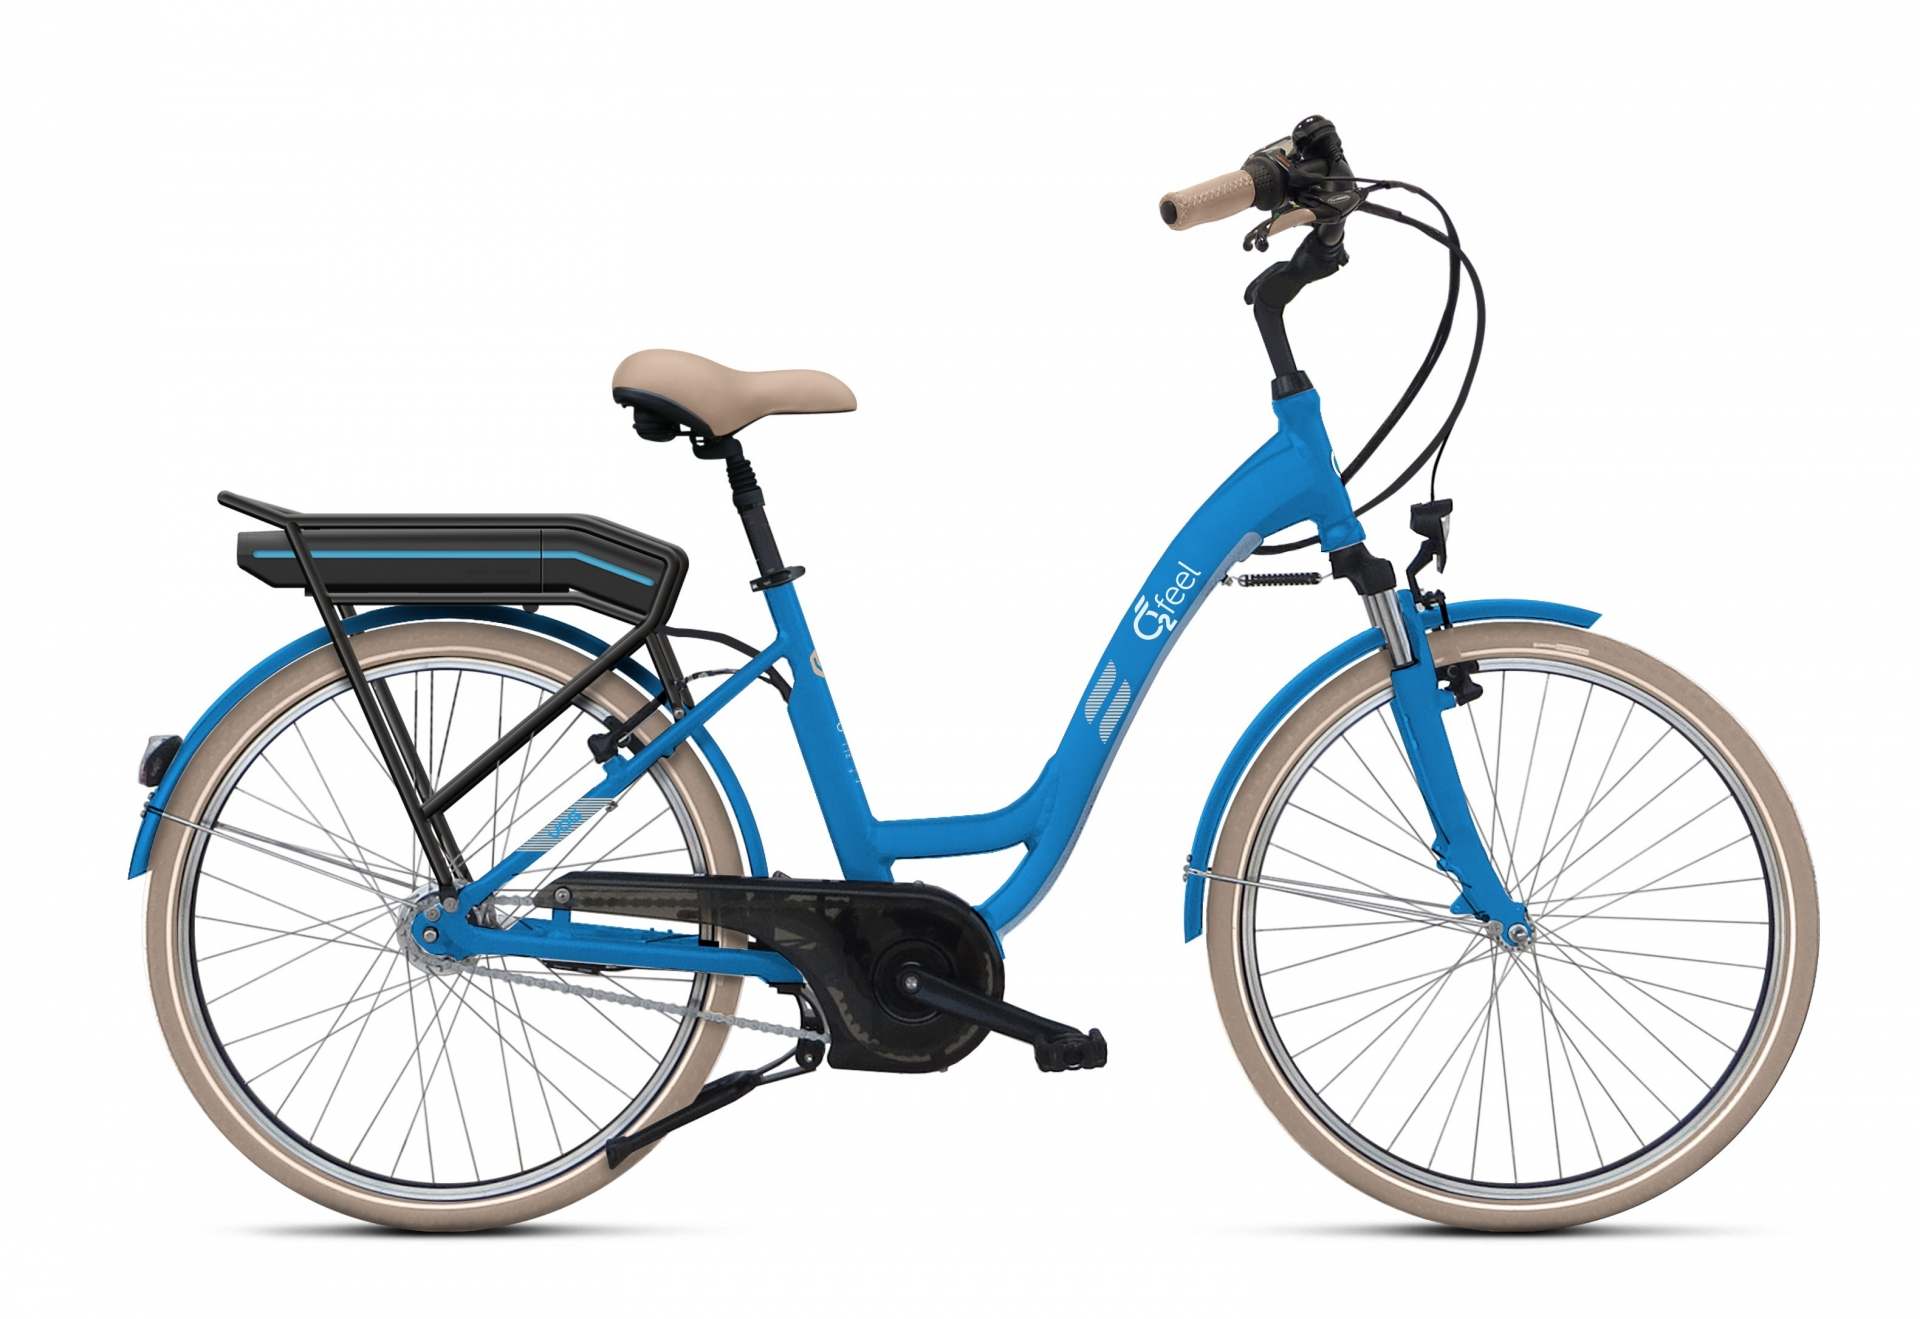 Vélo électrique O2Feel Vog N7C 26 374 Wh Skyblue Limited